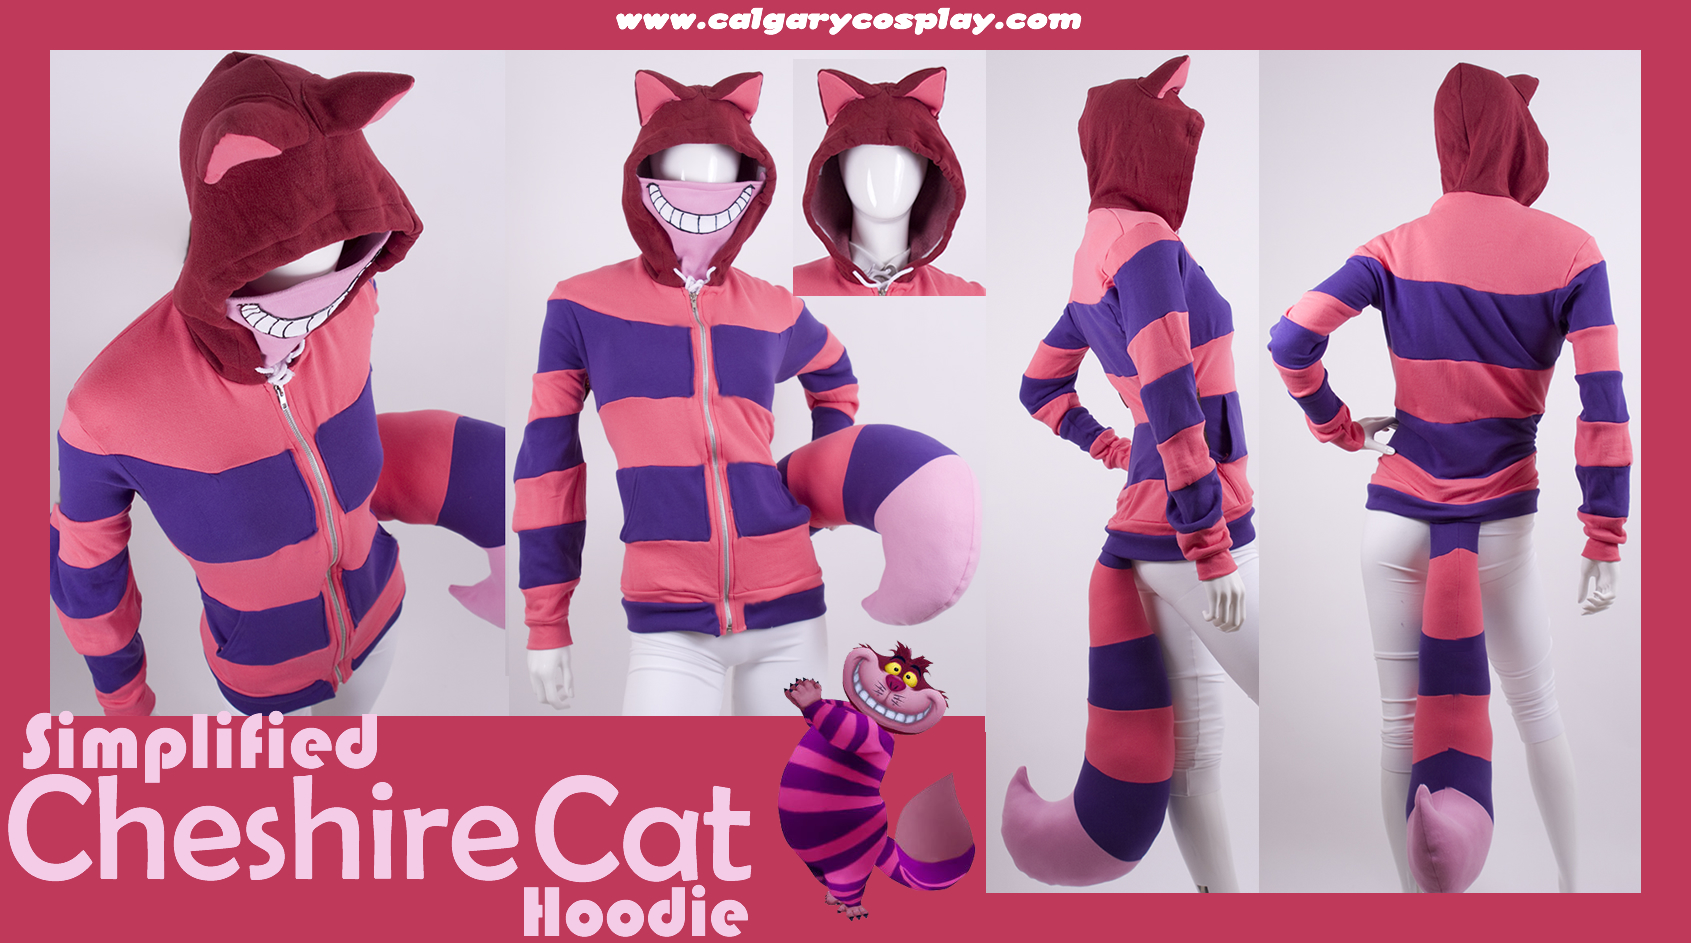 Simple Cheshire Cat Hoodie by calgarycosplay